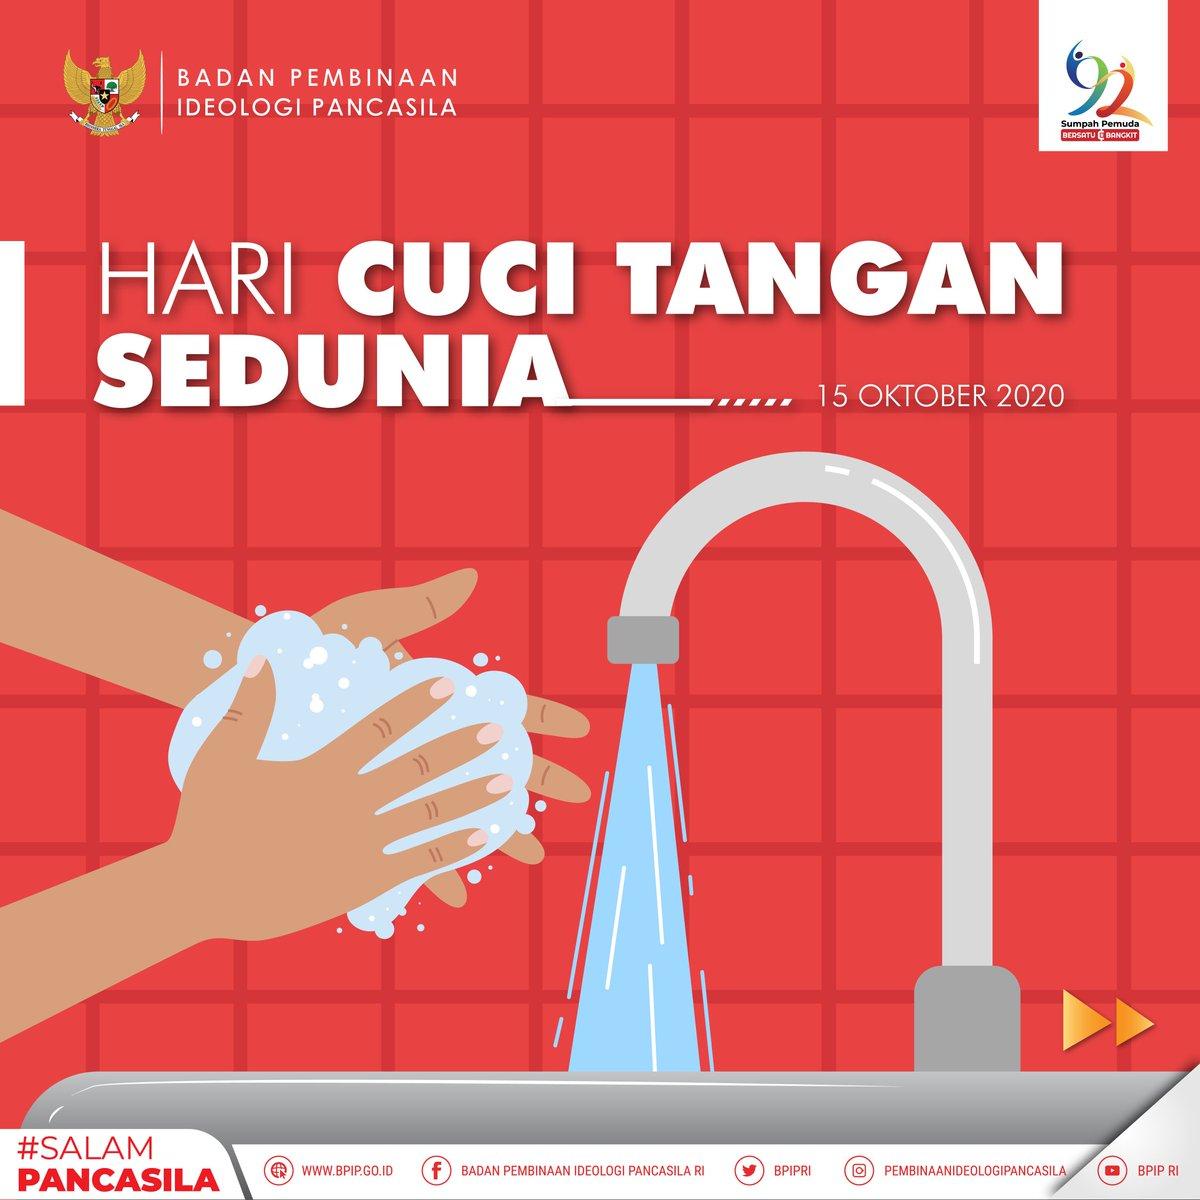 #SalamPancasila  Hai #SobatPancasila sudah tahu belum? Hari ini dunia merayakan Hari Cuci Tangan Sedunia.  Di masa pandemi seperti sekarang ini, sangat penting loh untuk kita mencuci tangan yang bersih sesuai dengan ketentuannya.  #HariCuciTanganSedunia #CeritaPancasila #BPIP https://t.co/eWcO00YKAR